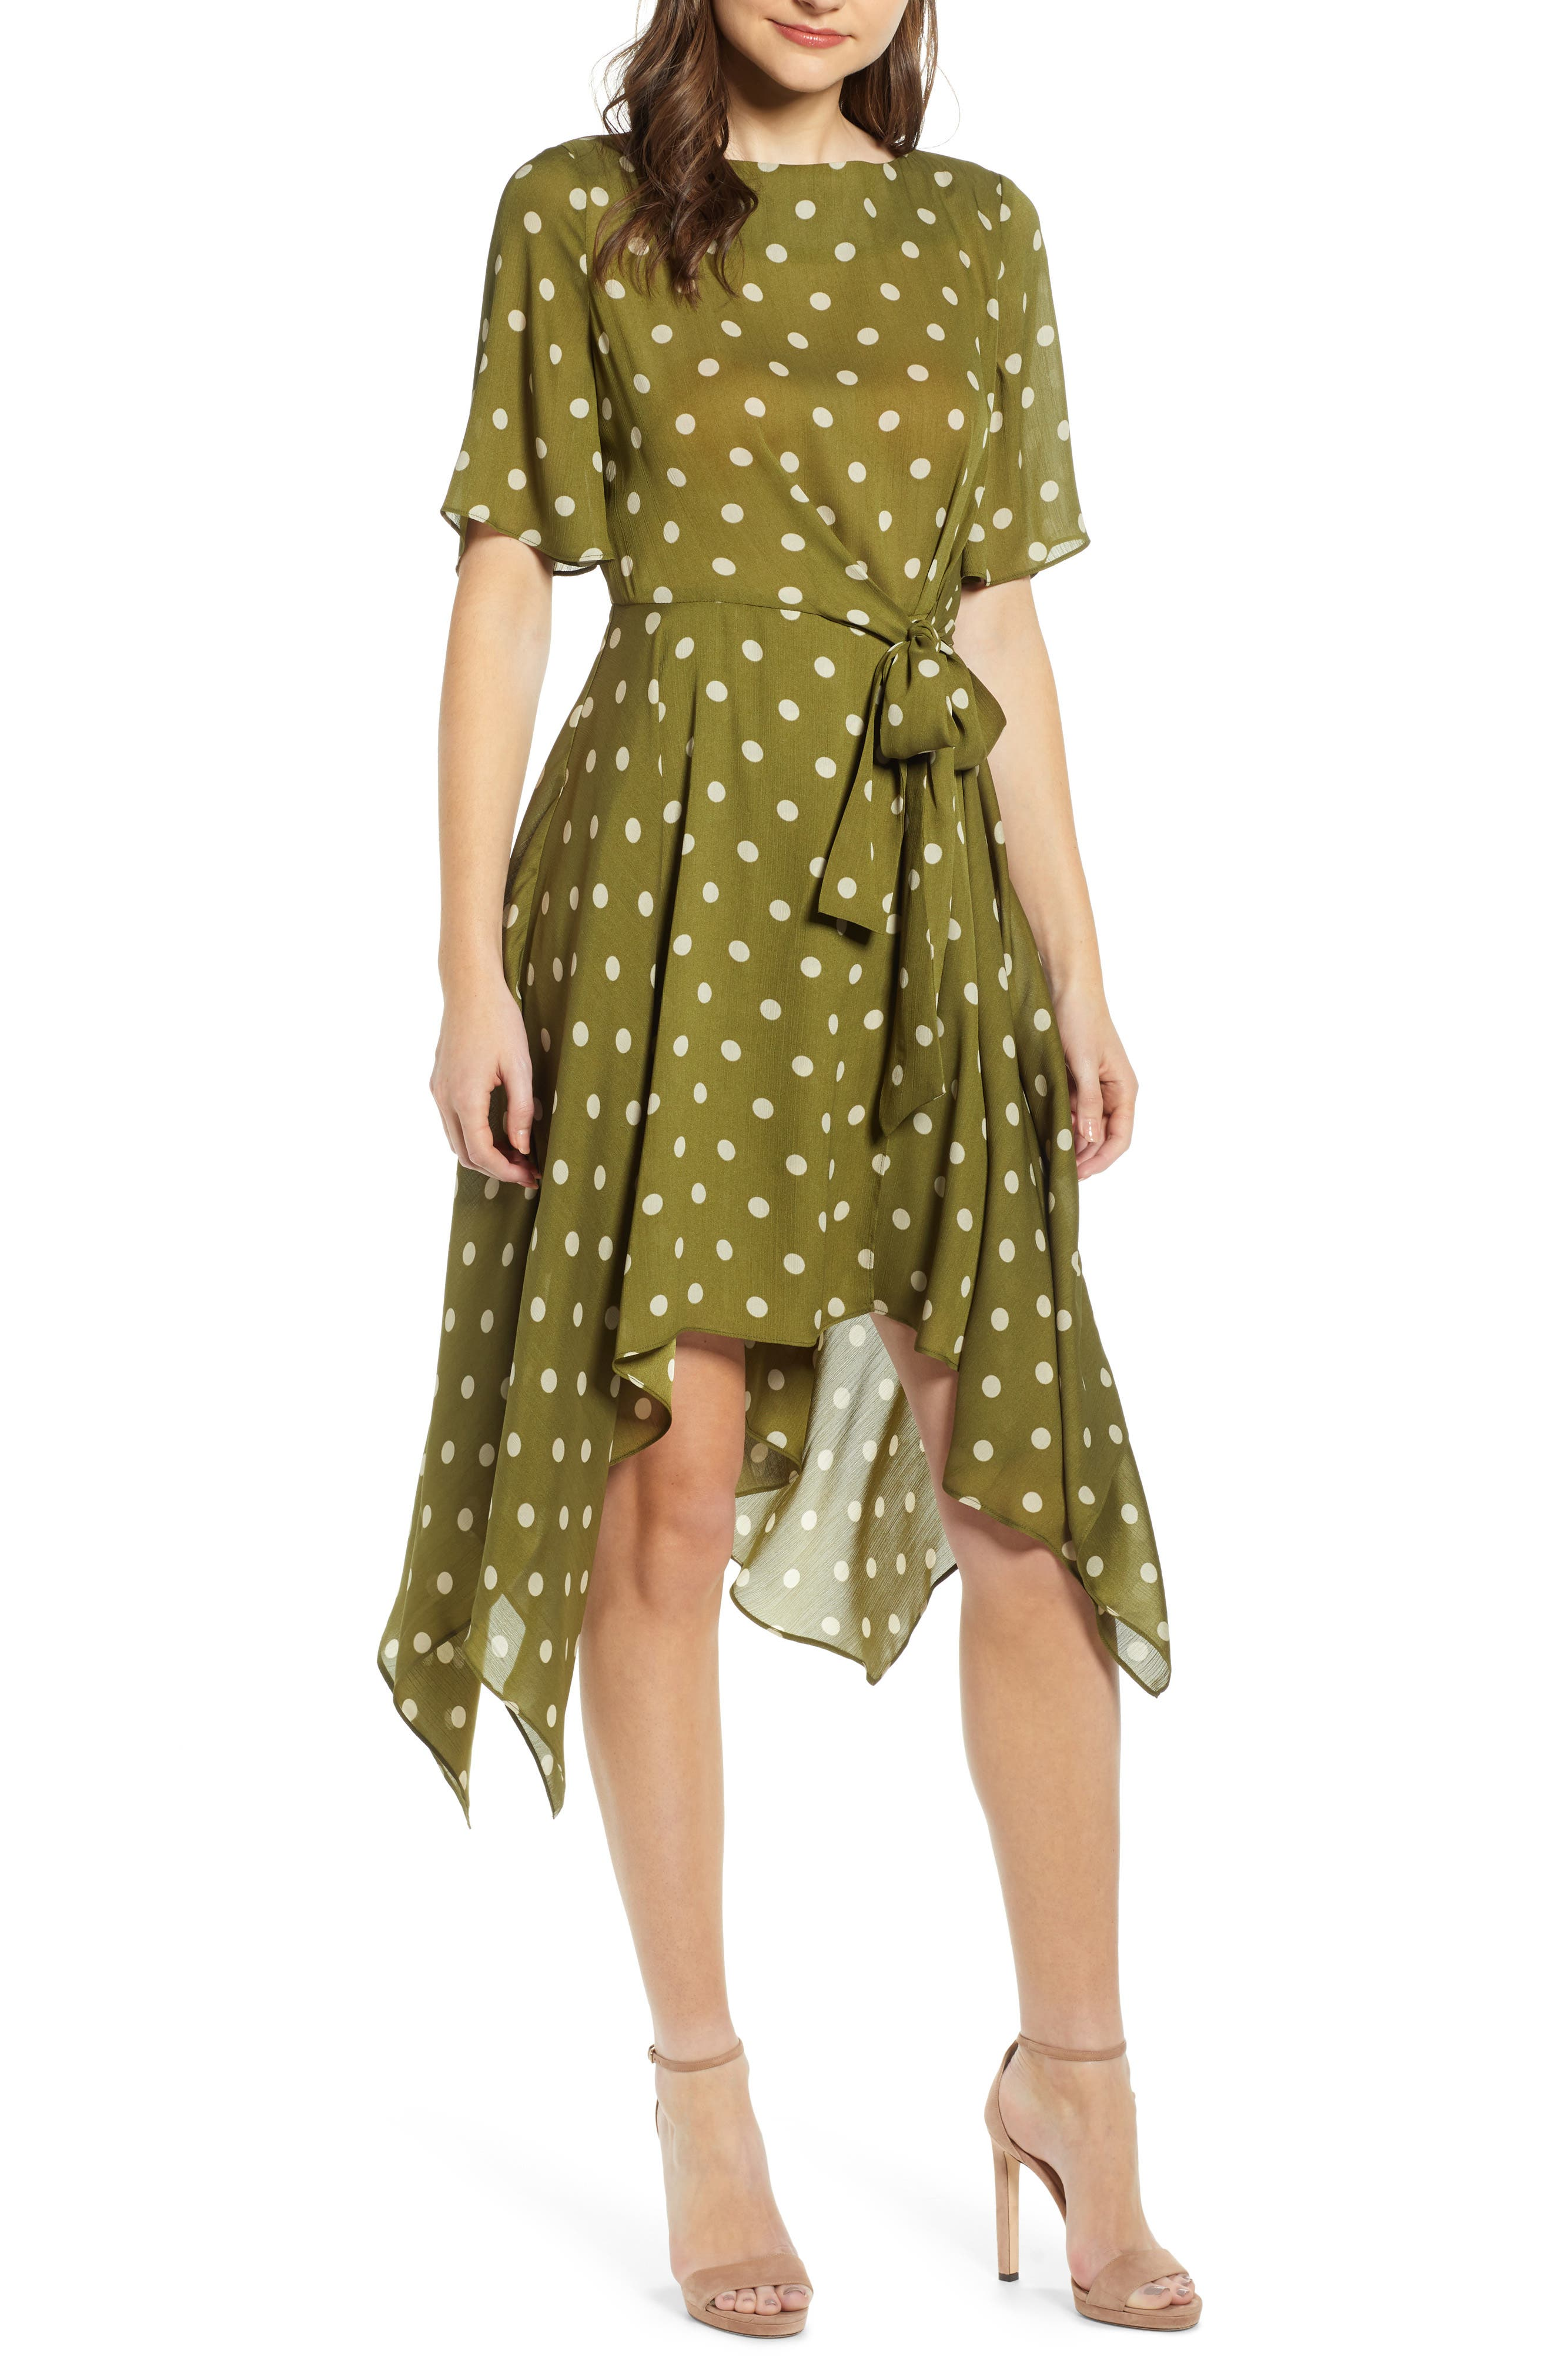 CHRISELLE LIM COLLECTION, Chriselle Lim Marie Handkerchief Hem Midi Dress, Main thumbnail 1, color, CREAM/ OLIVE